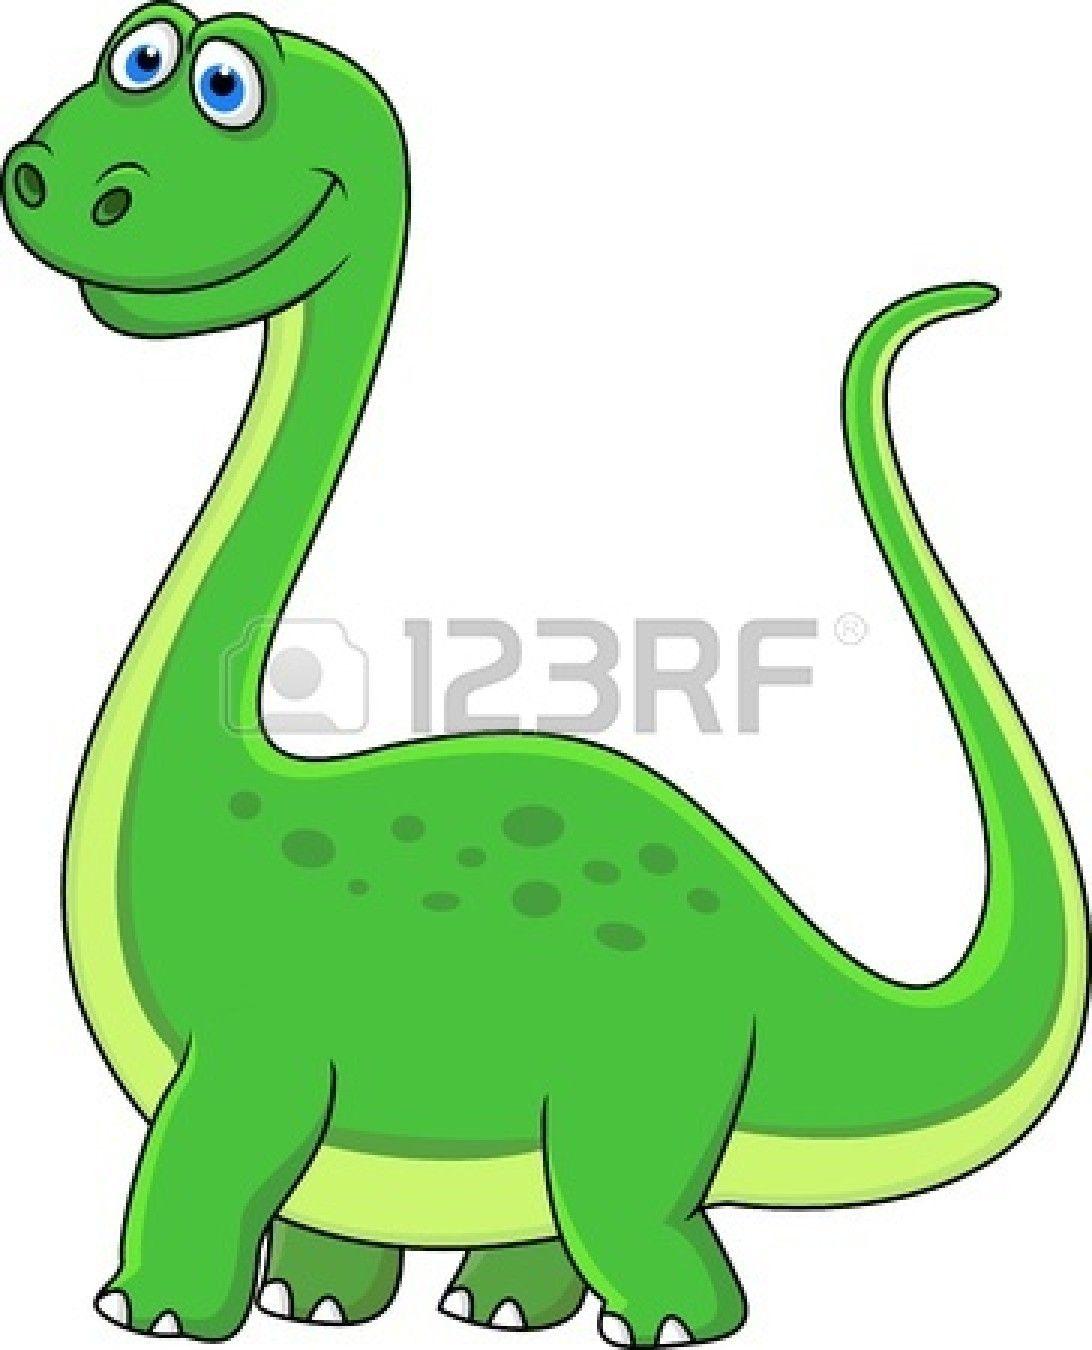 dinosaur cartoon images | dinosaur-cartoon-15234277-dinosaur-cartoon ...